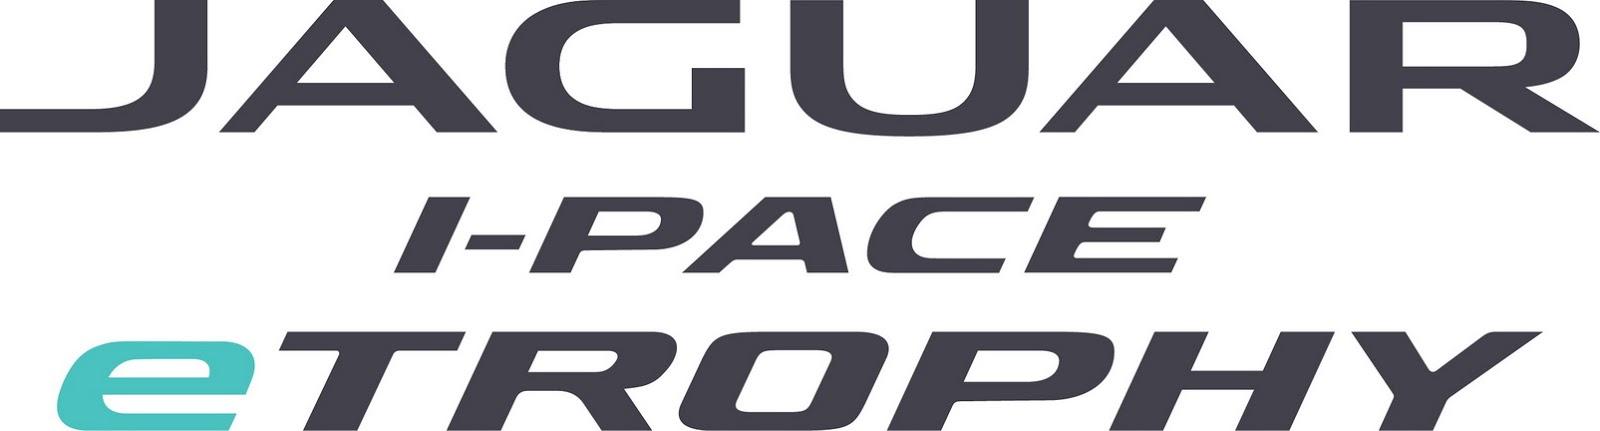 jaguar-ipace-race-car-iaa-28